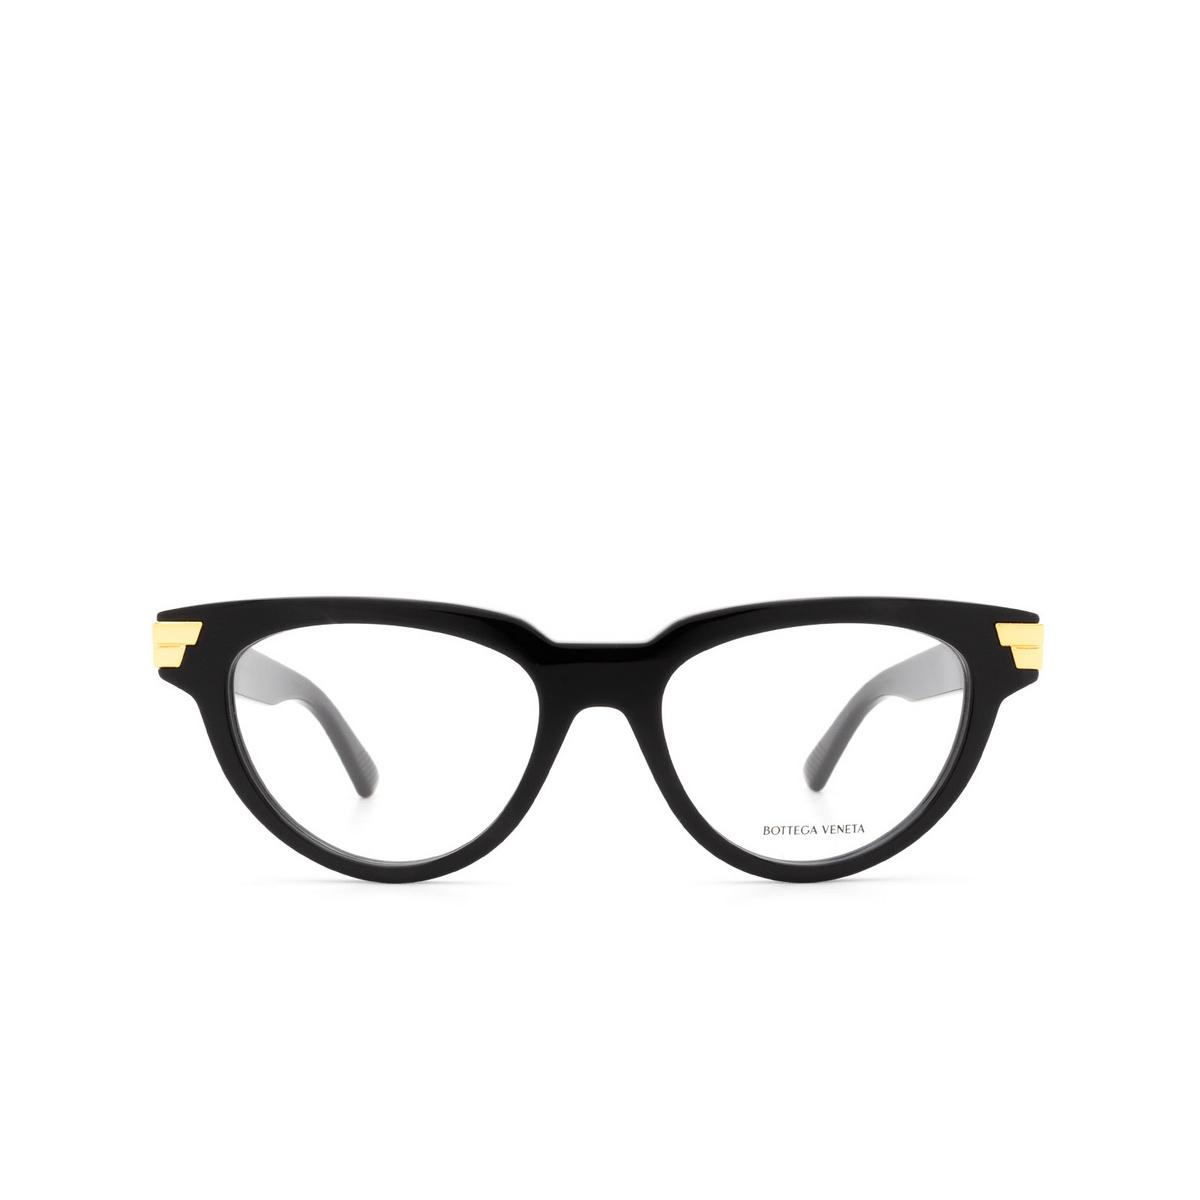 Bottega Veneta® Cat-eye Eyeglasses: BV1106O color Black 001 - front view.